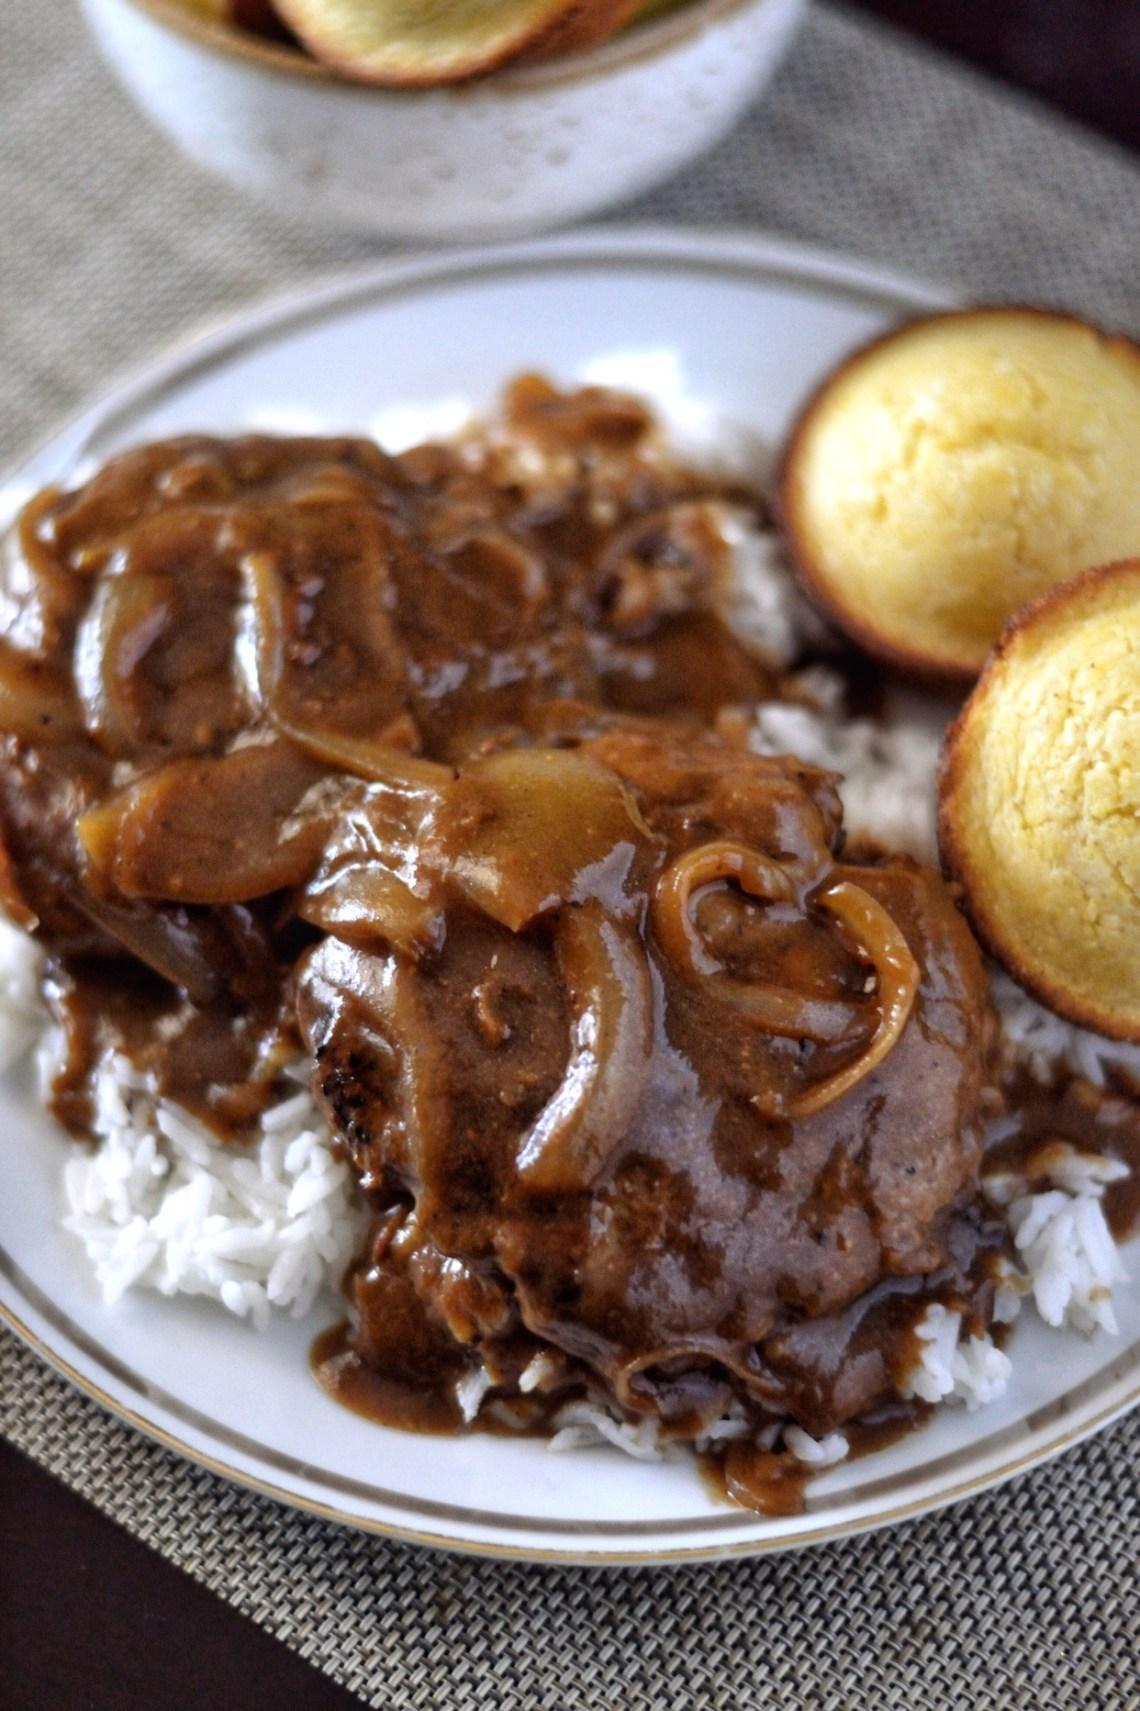 Home Style Hamburger Steak and Onion Gravy Recipe